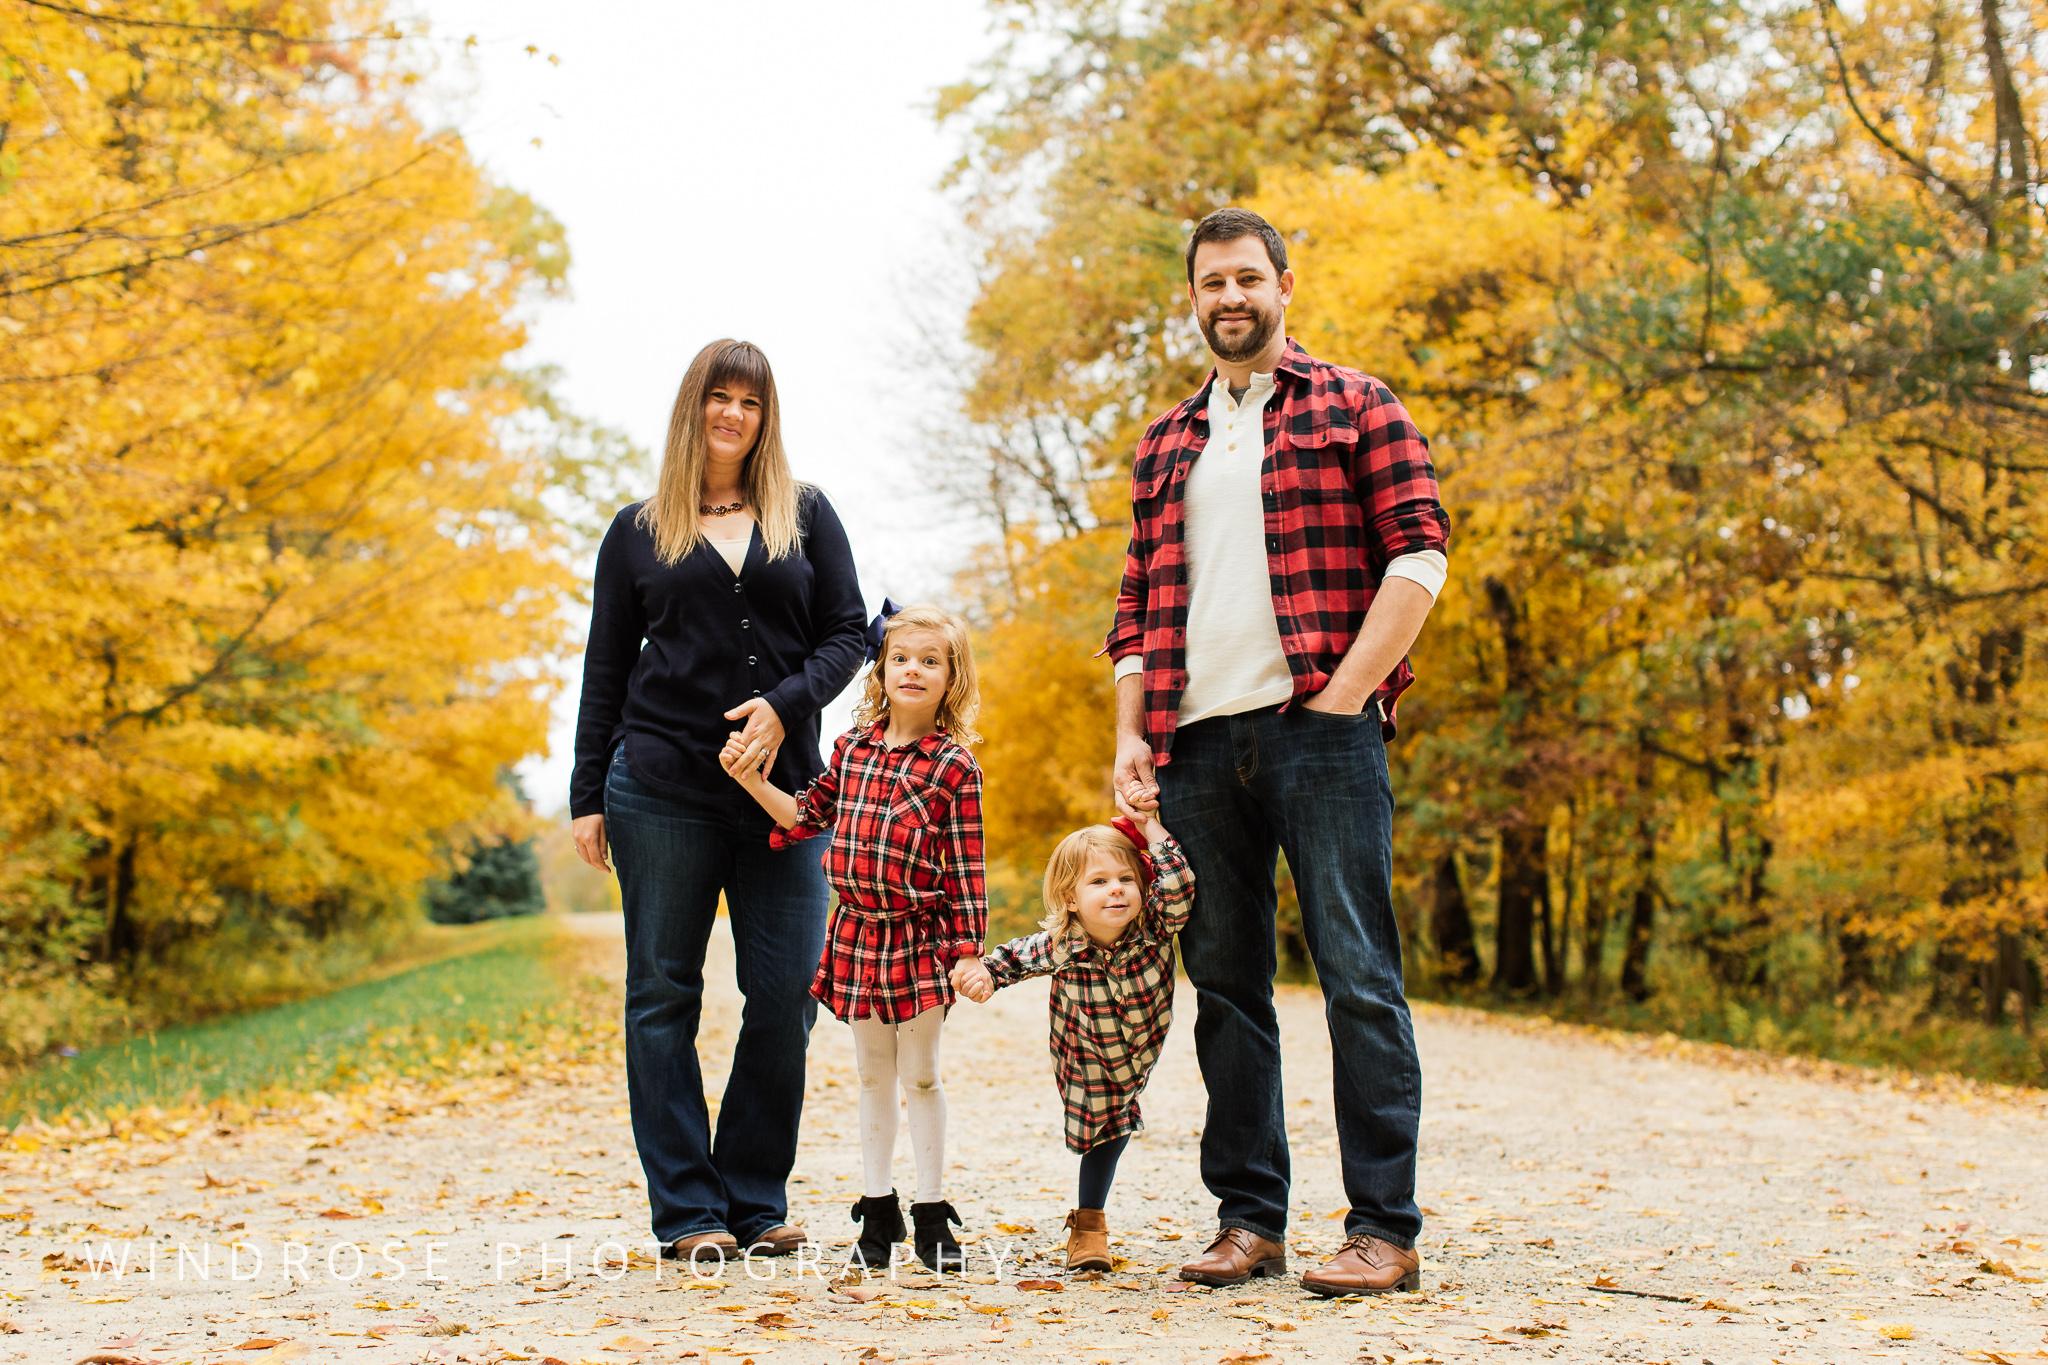 Fall-Family-Portrait-Session-Byron-MN-16.jpg